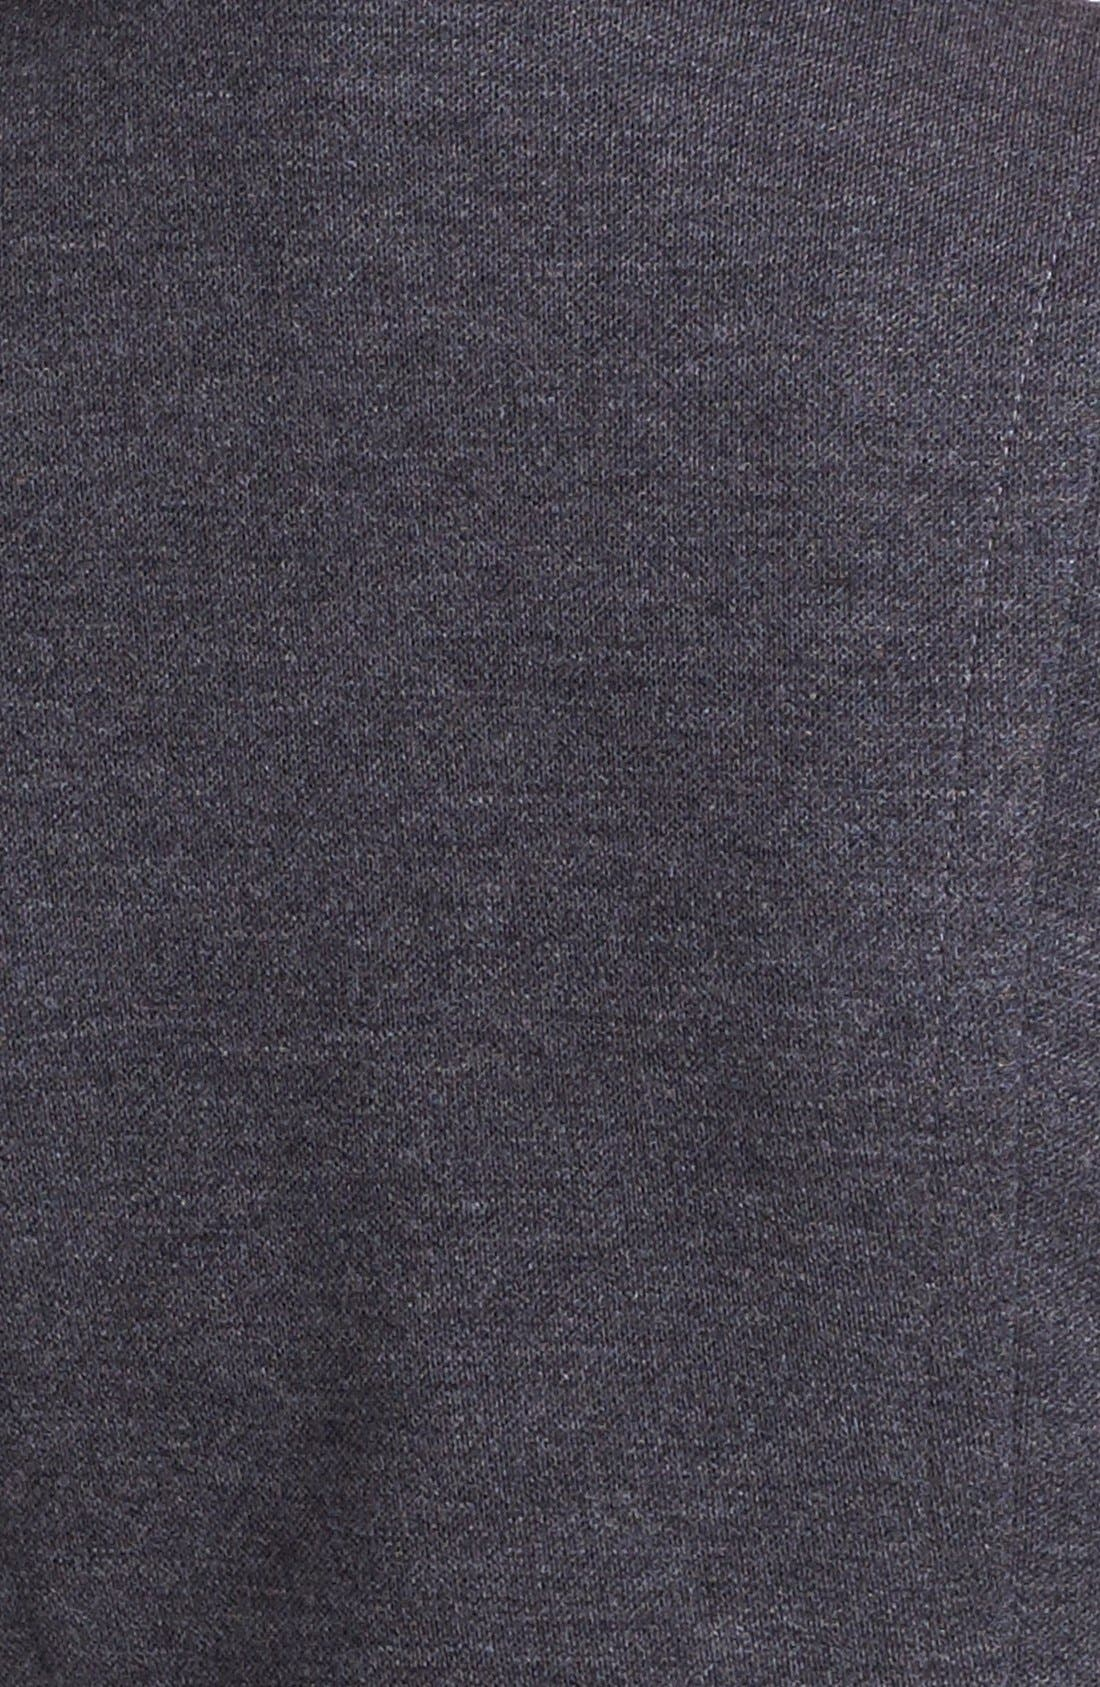 'Milly Milano' Jacket,                             Alternate thumbnail 4, color,                             020